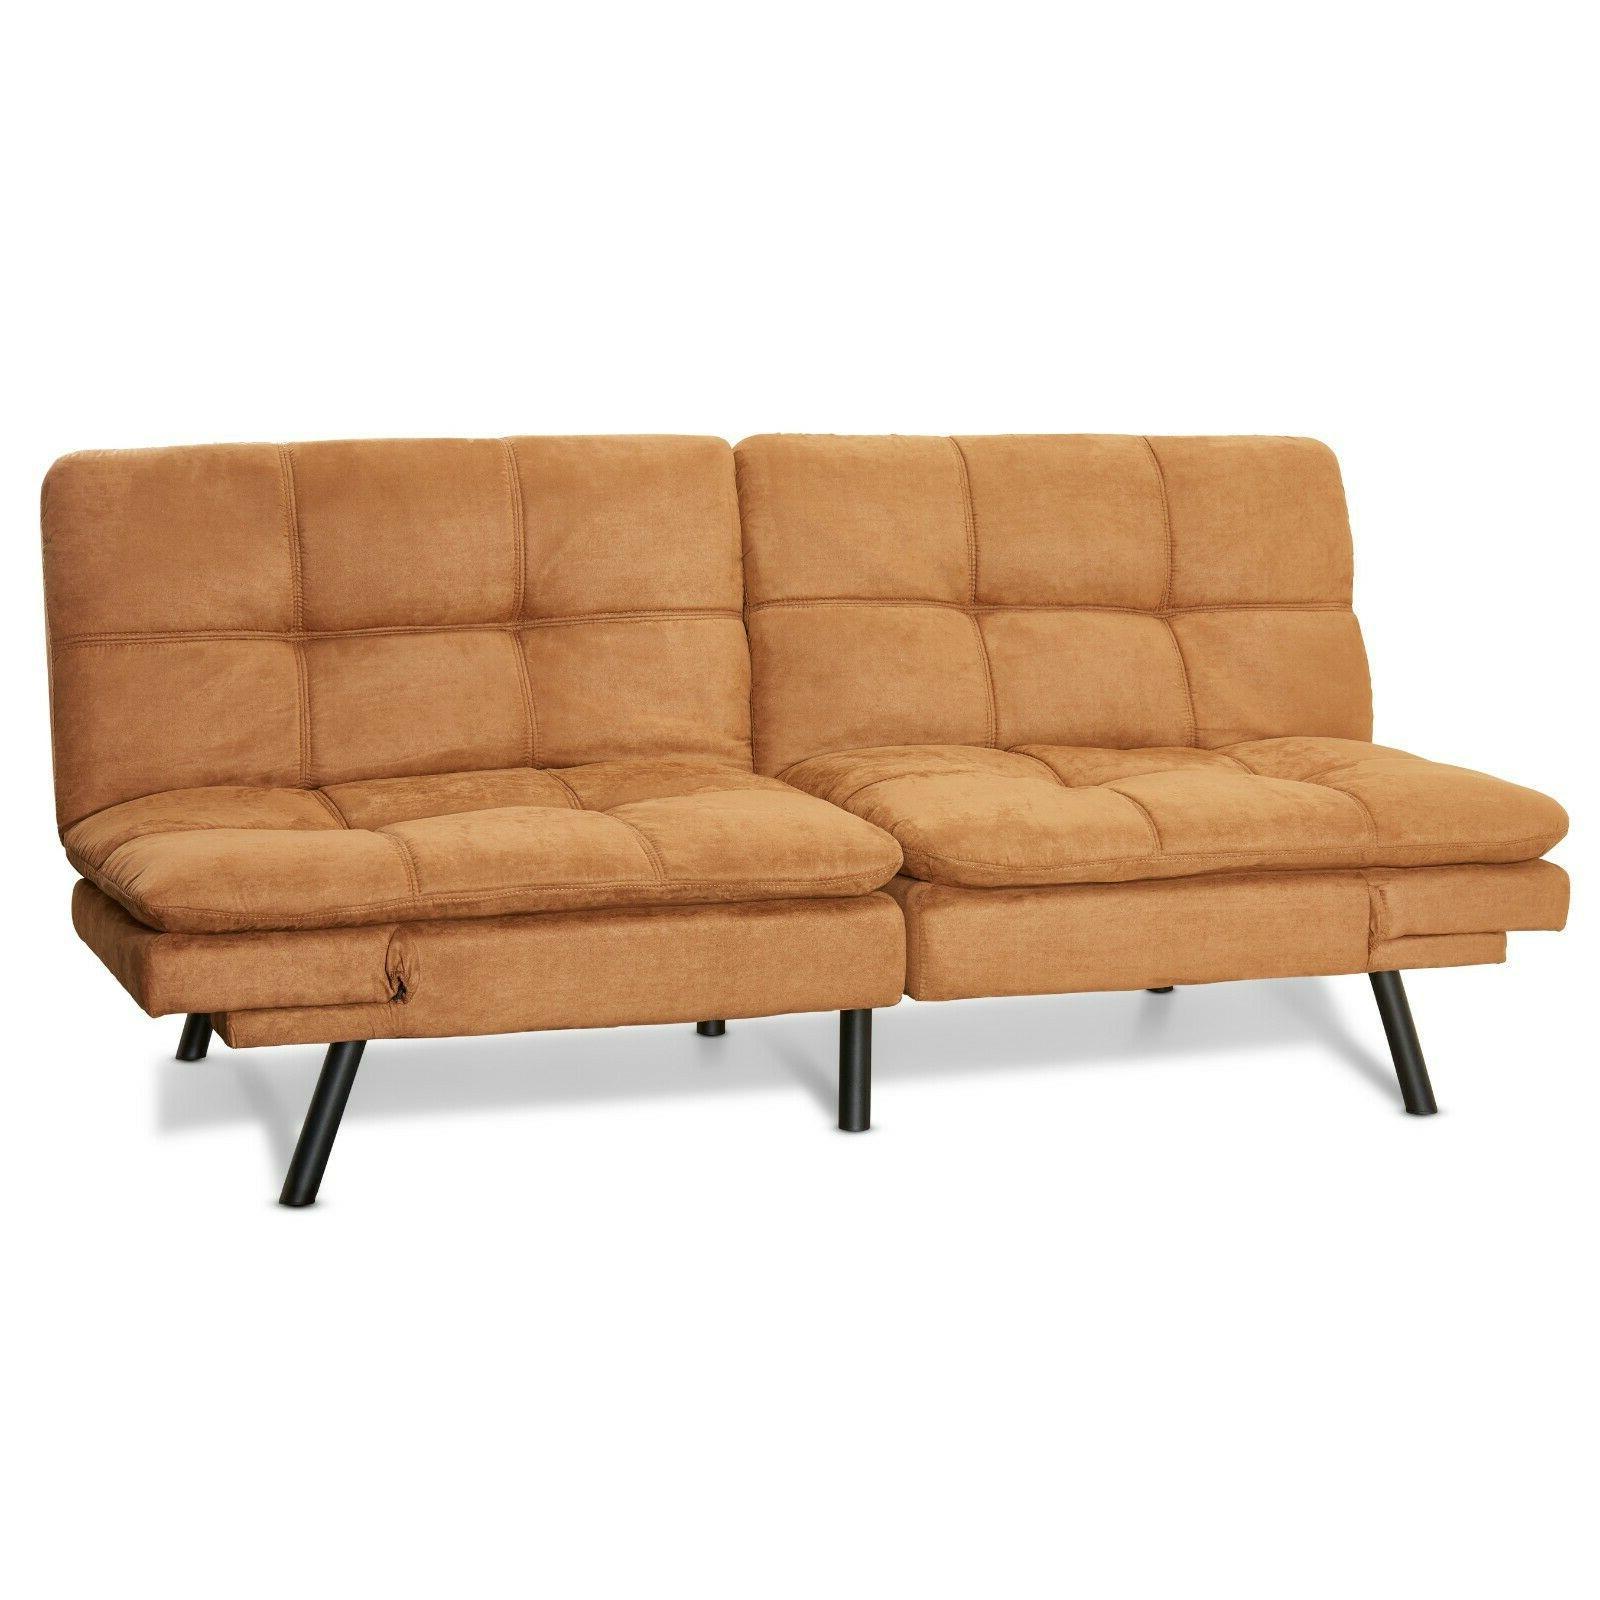 Memory Foam Futon Bed Sleeper Convertible Foldable Loveseat Size